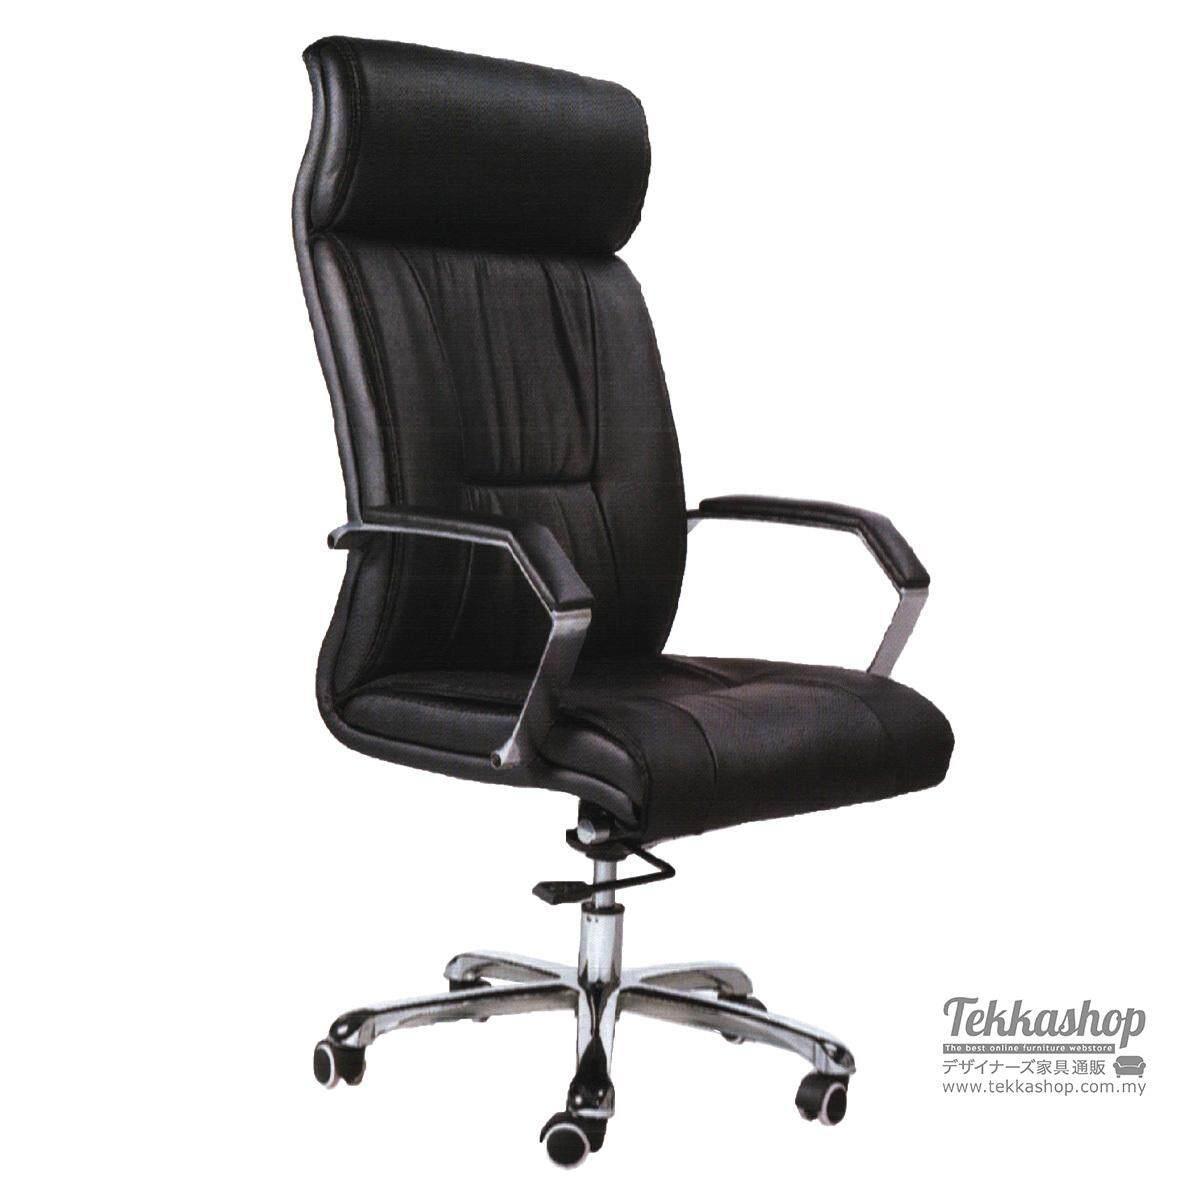 office chair executive uk adjustable chrome previous shop desk mesh fabric seat computer